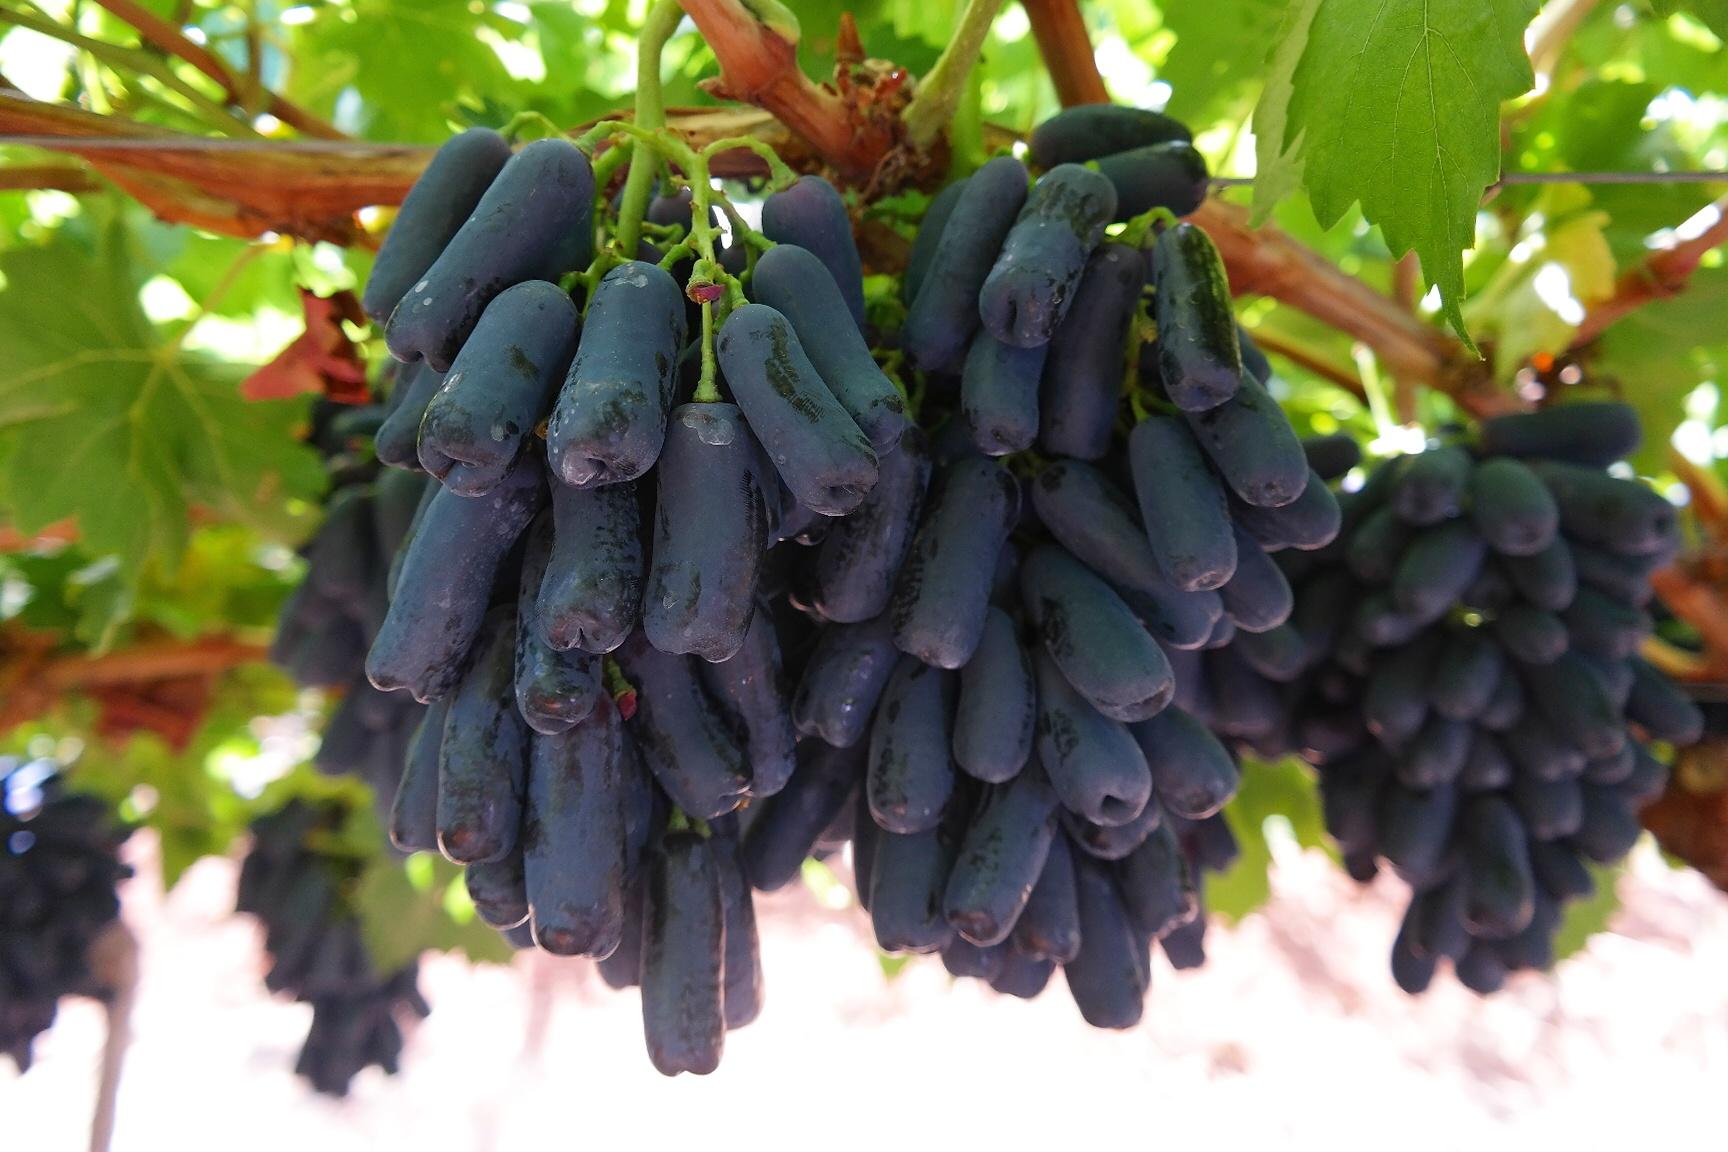 Fullsize Of Moon Drop Grapes